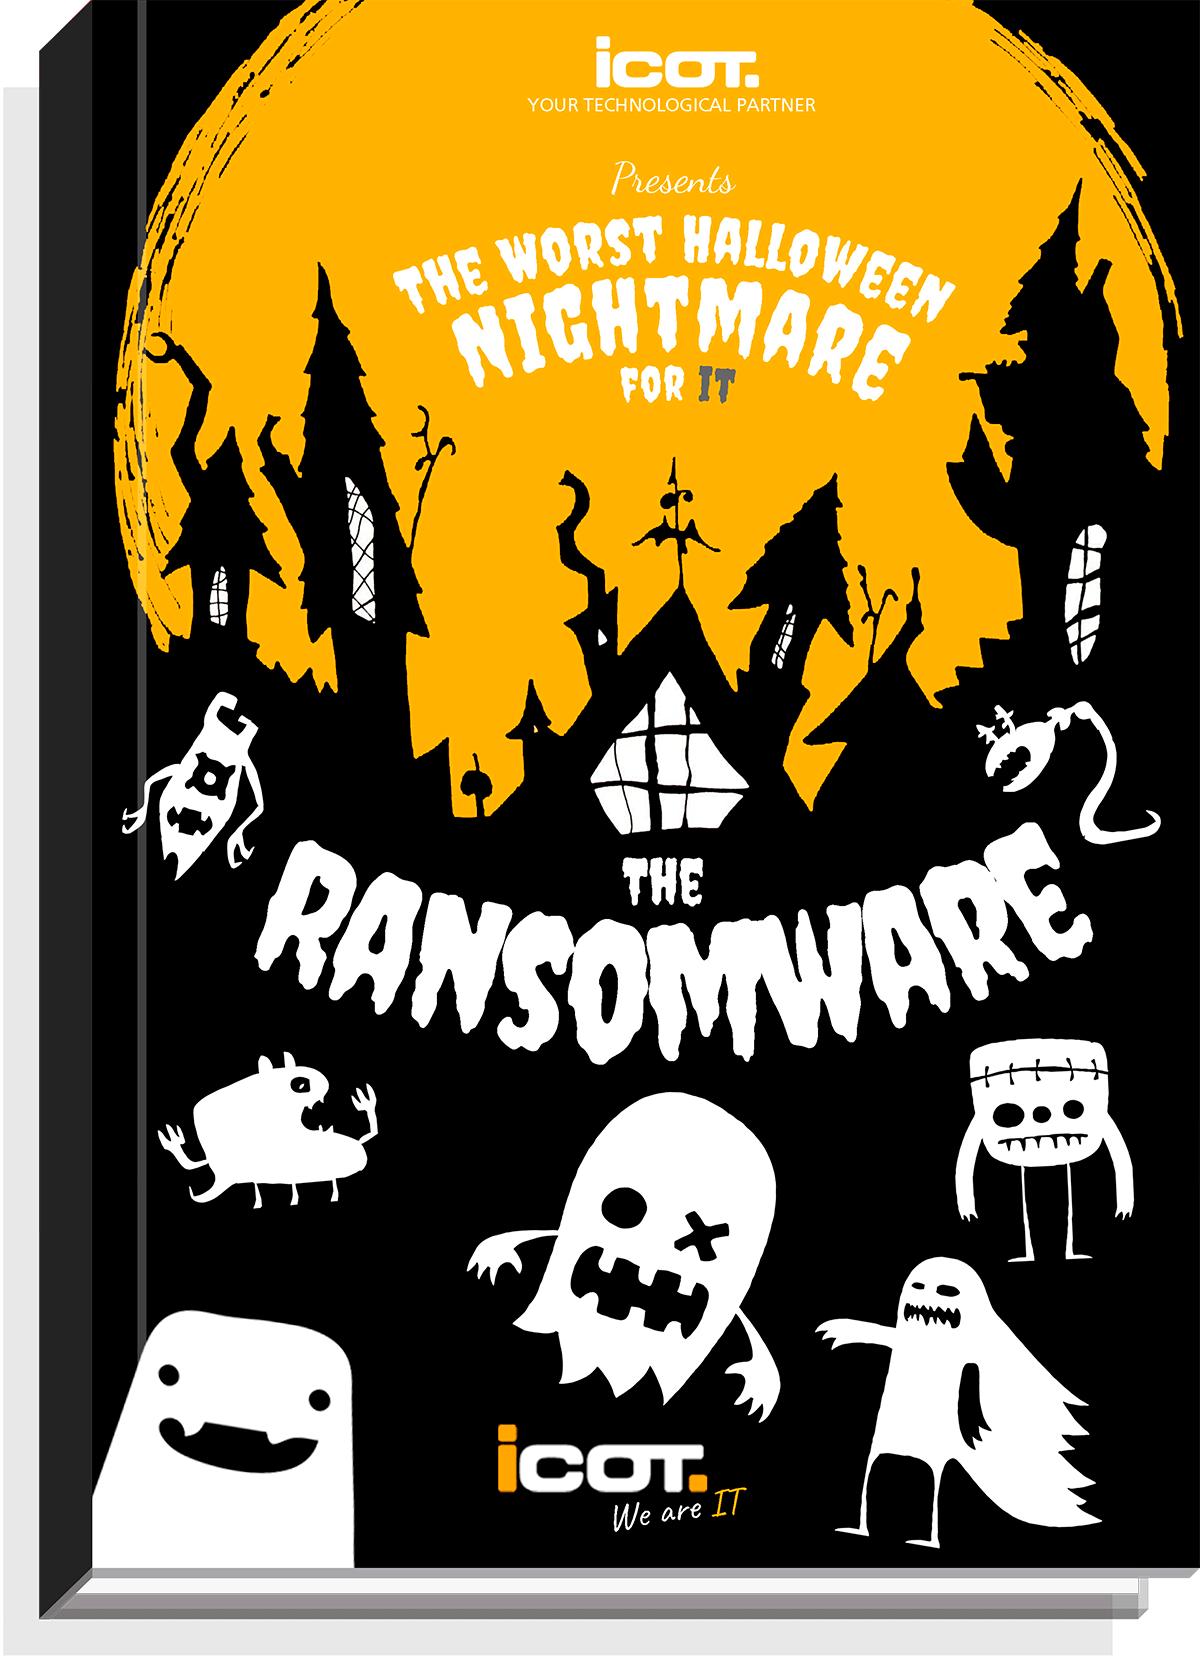 Un e-book con el ransomware como protagonista